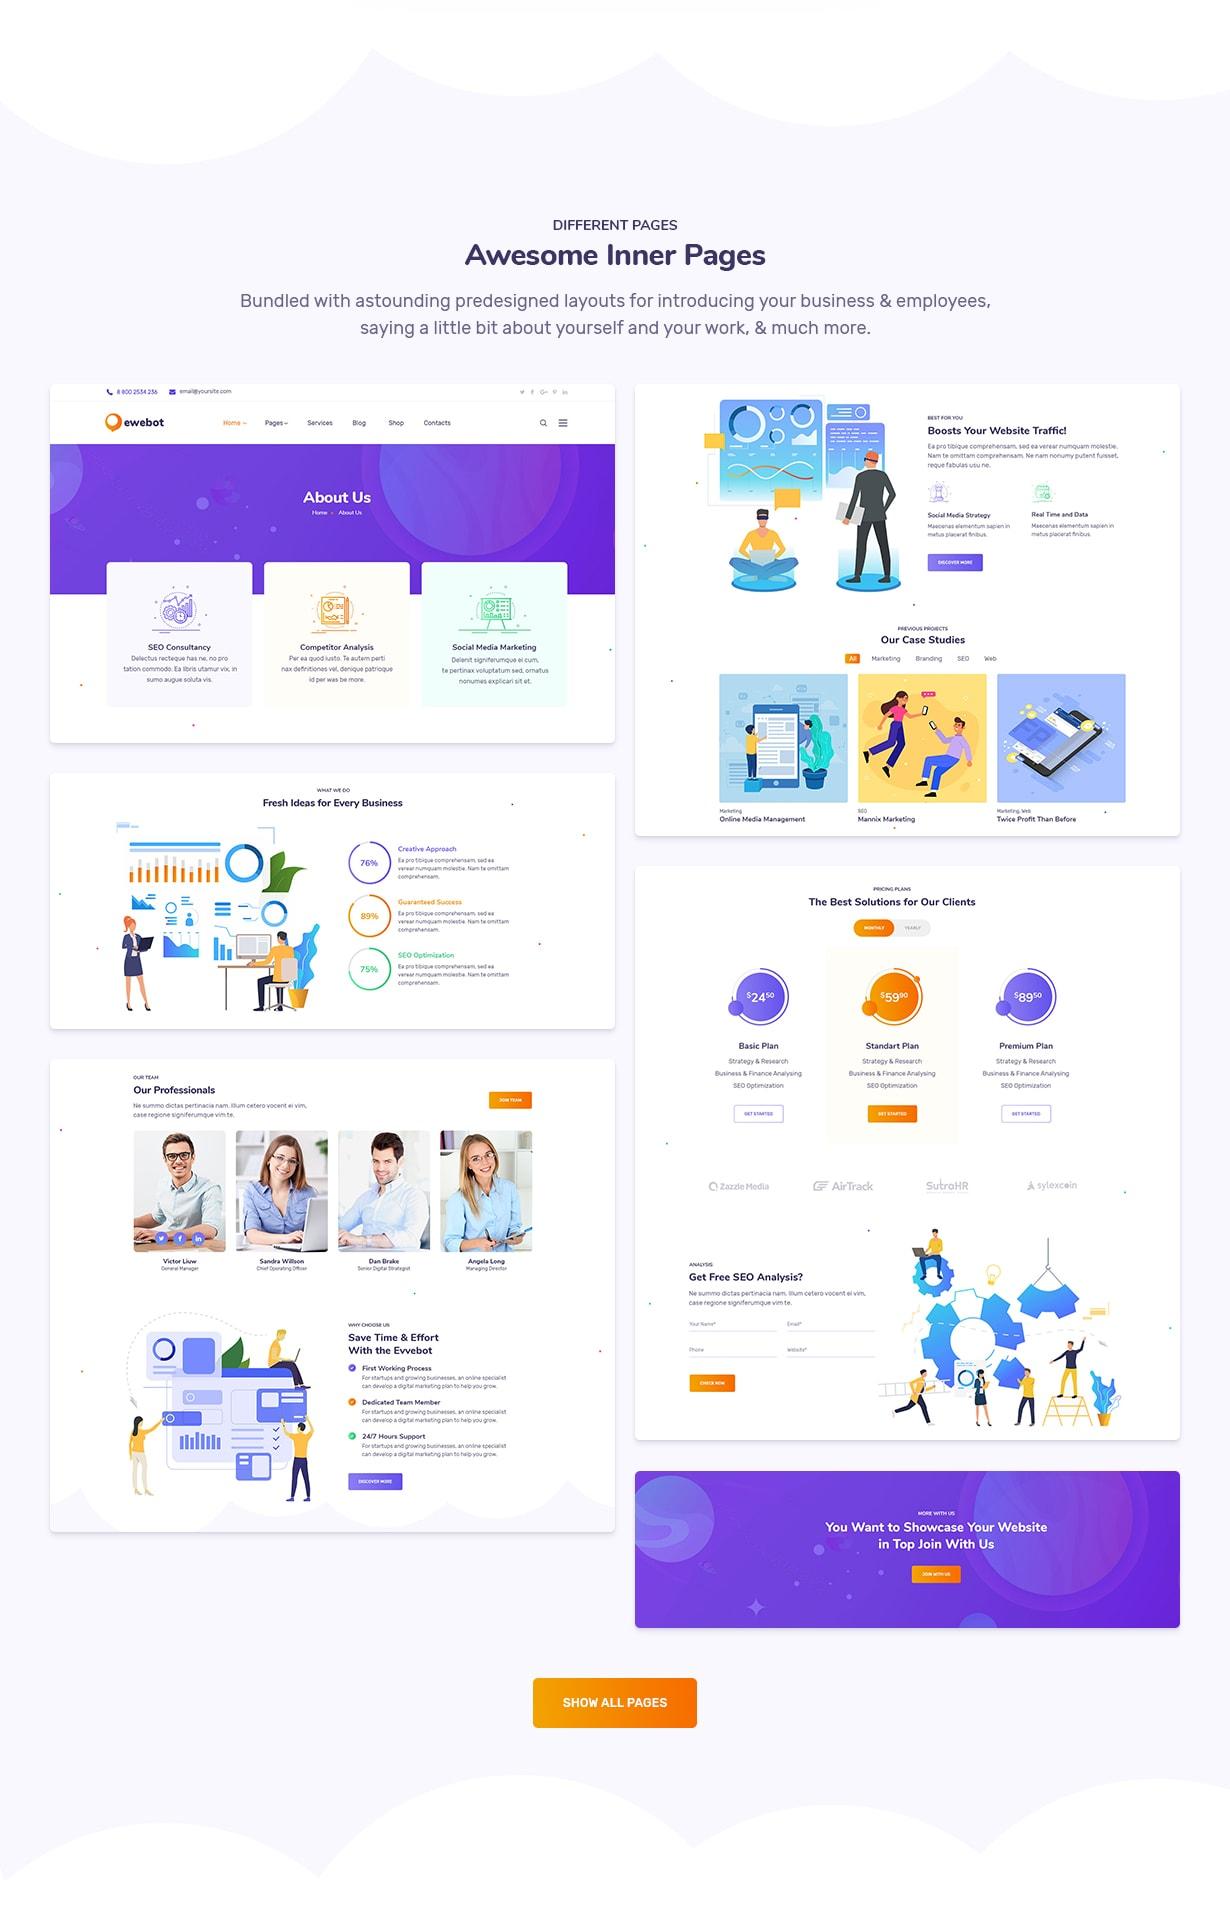 Ewebot - SEO Marketing & Digital Agency - 5